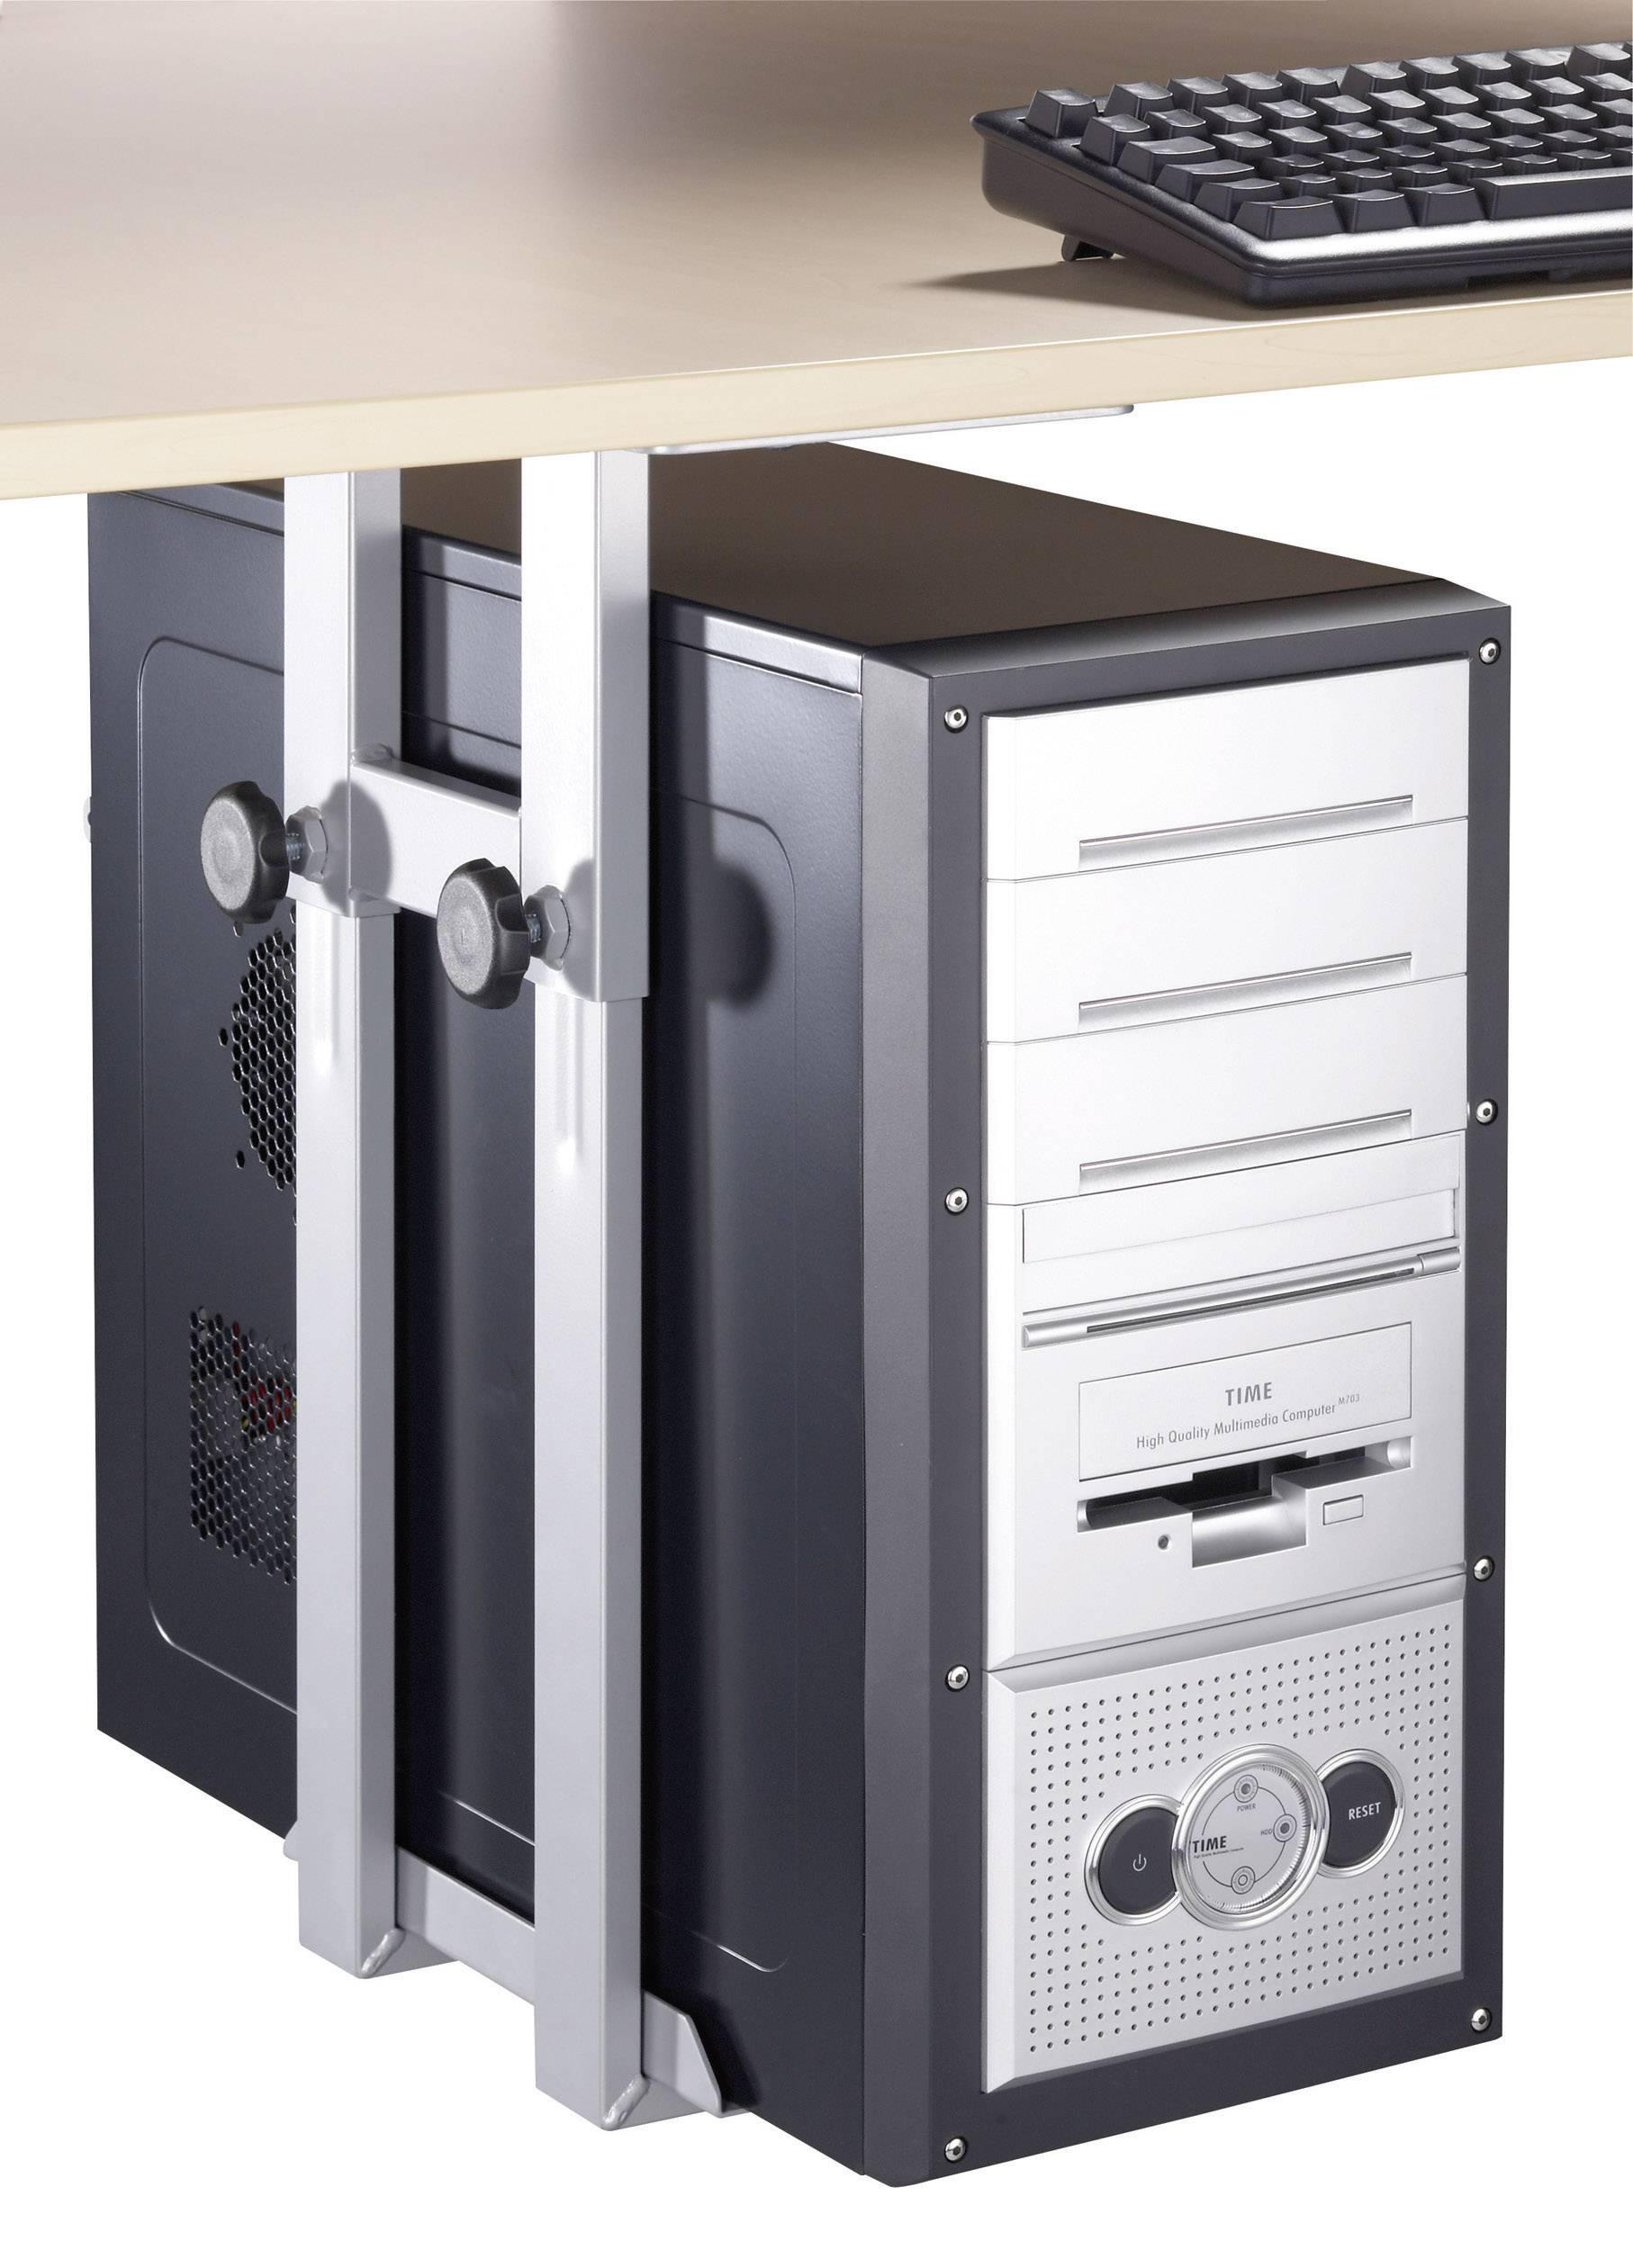 pc houder voor montage onder het bureau. Black Bedroom Furniture Sets. Home Design Ideas